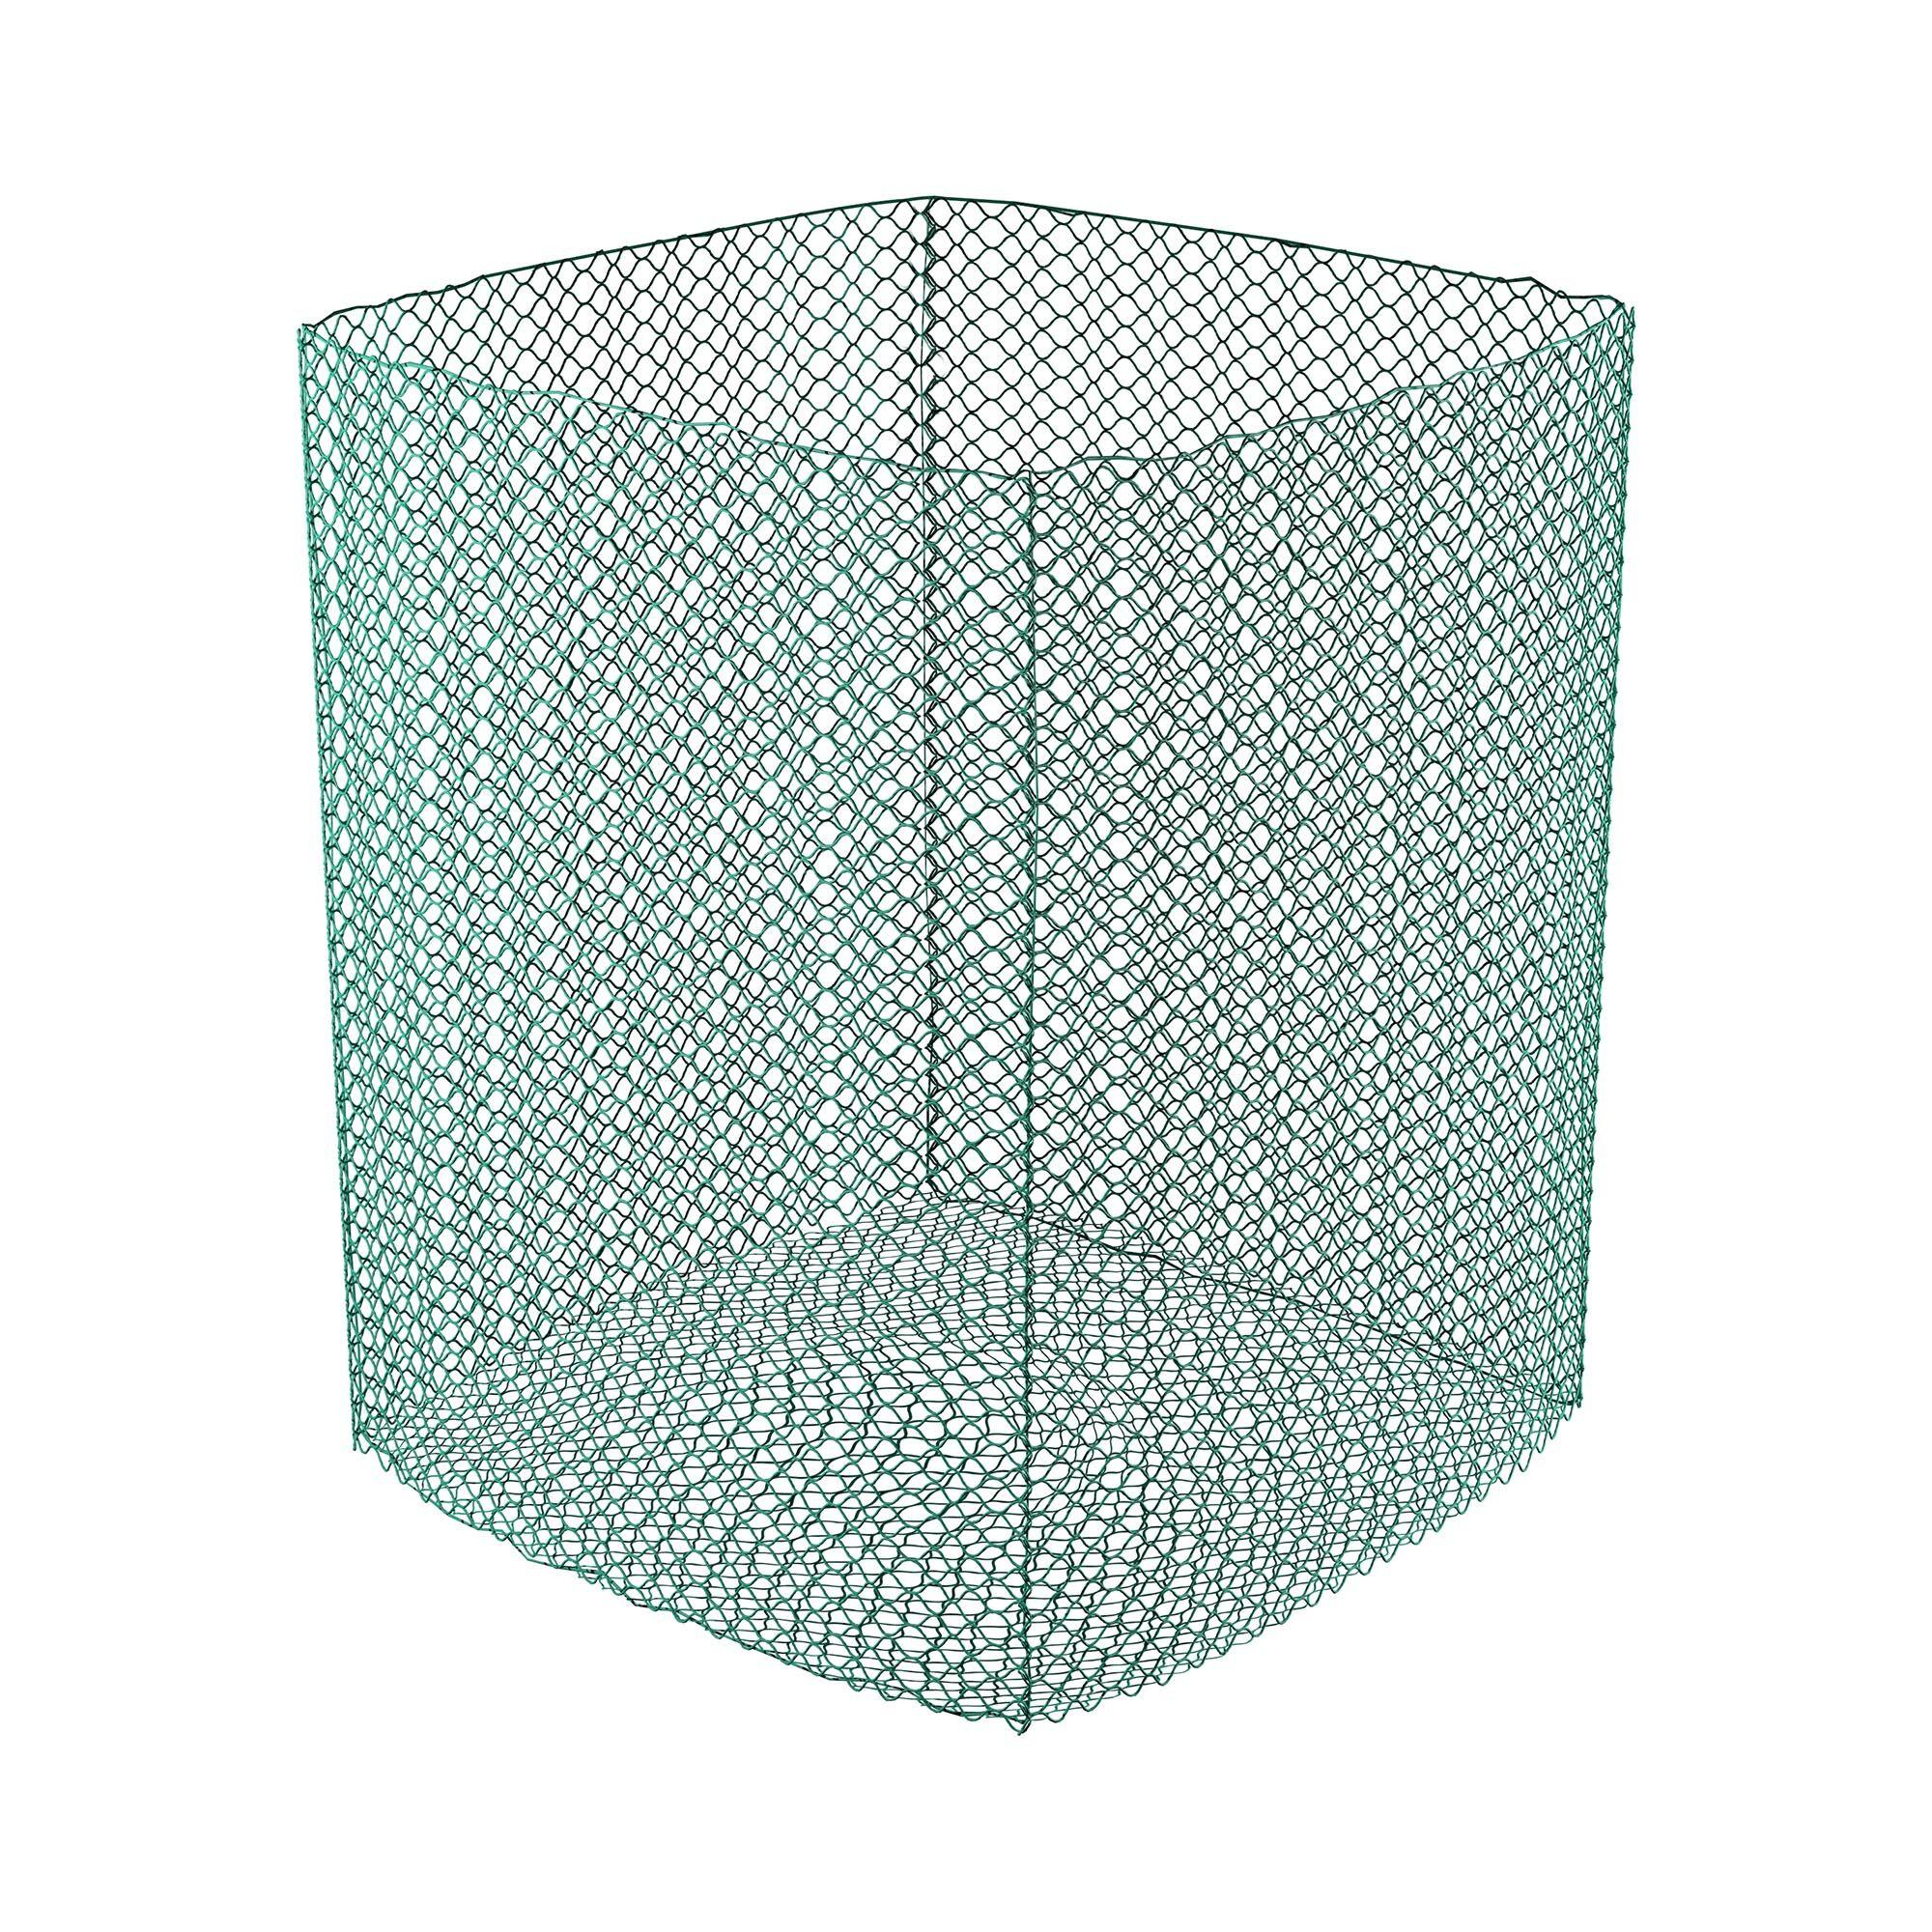 Wiesenfield Heunetz Rundballen - 1,4 x 1,4 x 1,6 m - engmaschig WIE-NET-1